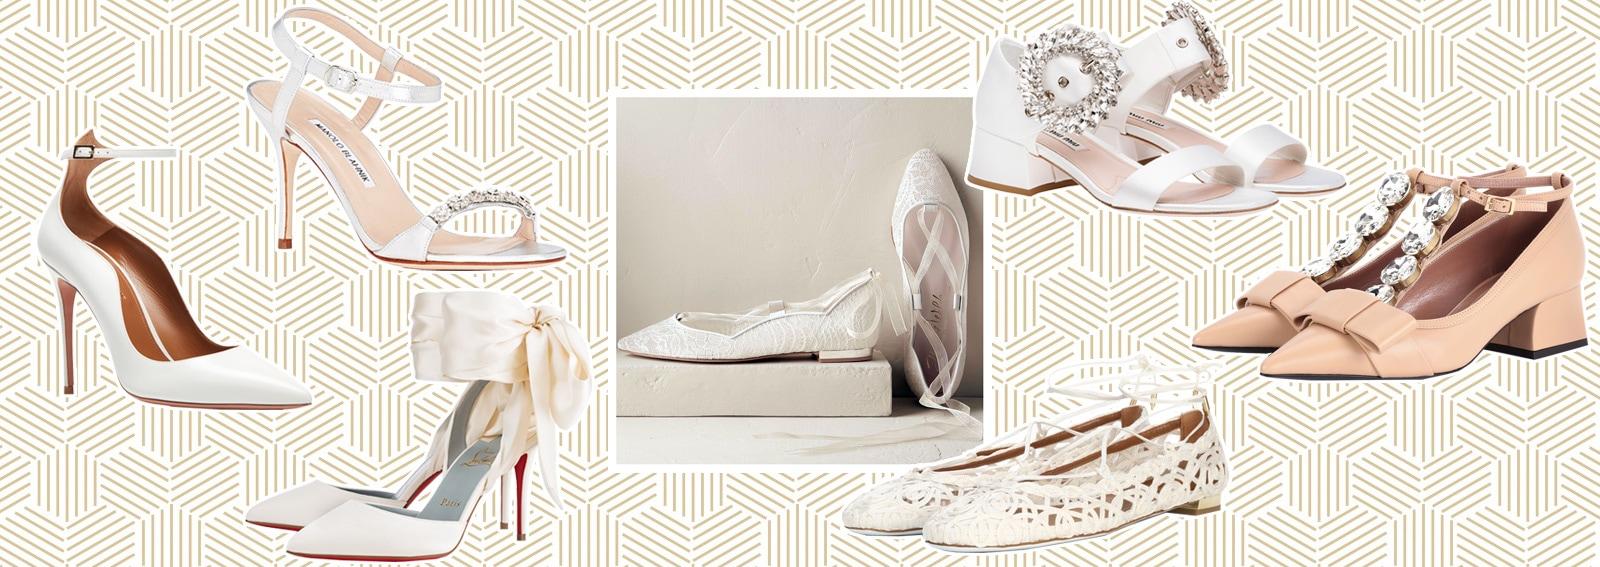 COVER_sposa_scarpe new 2017 DESKTOP